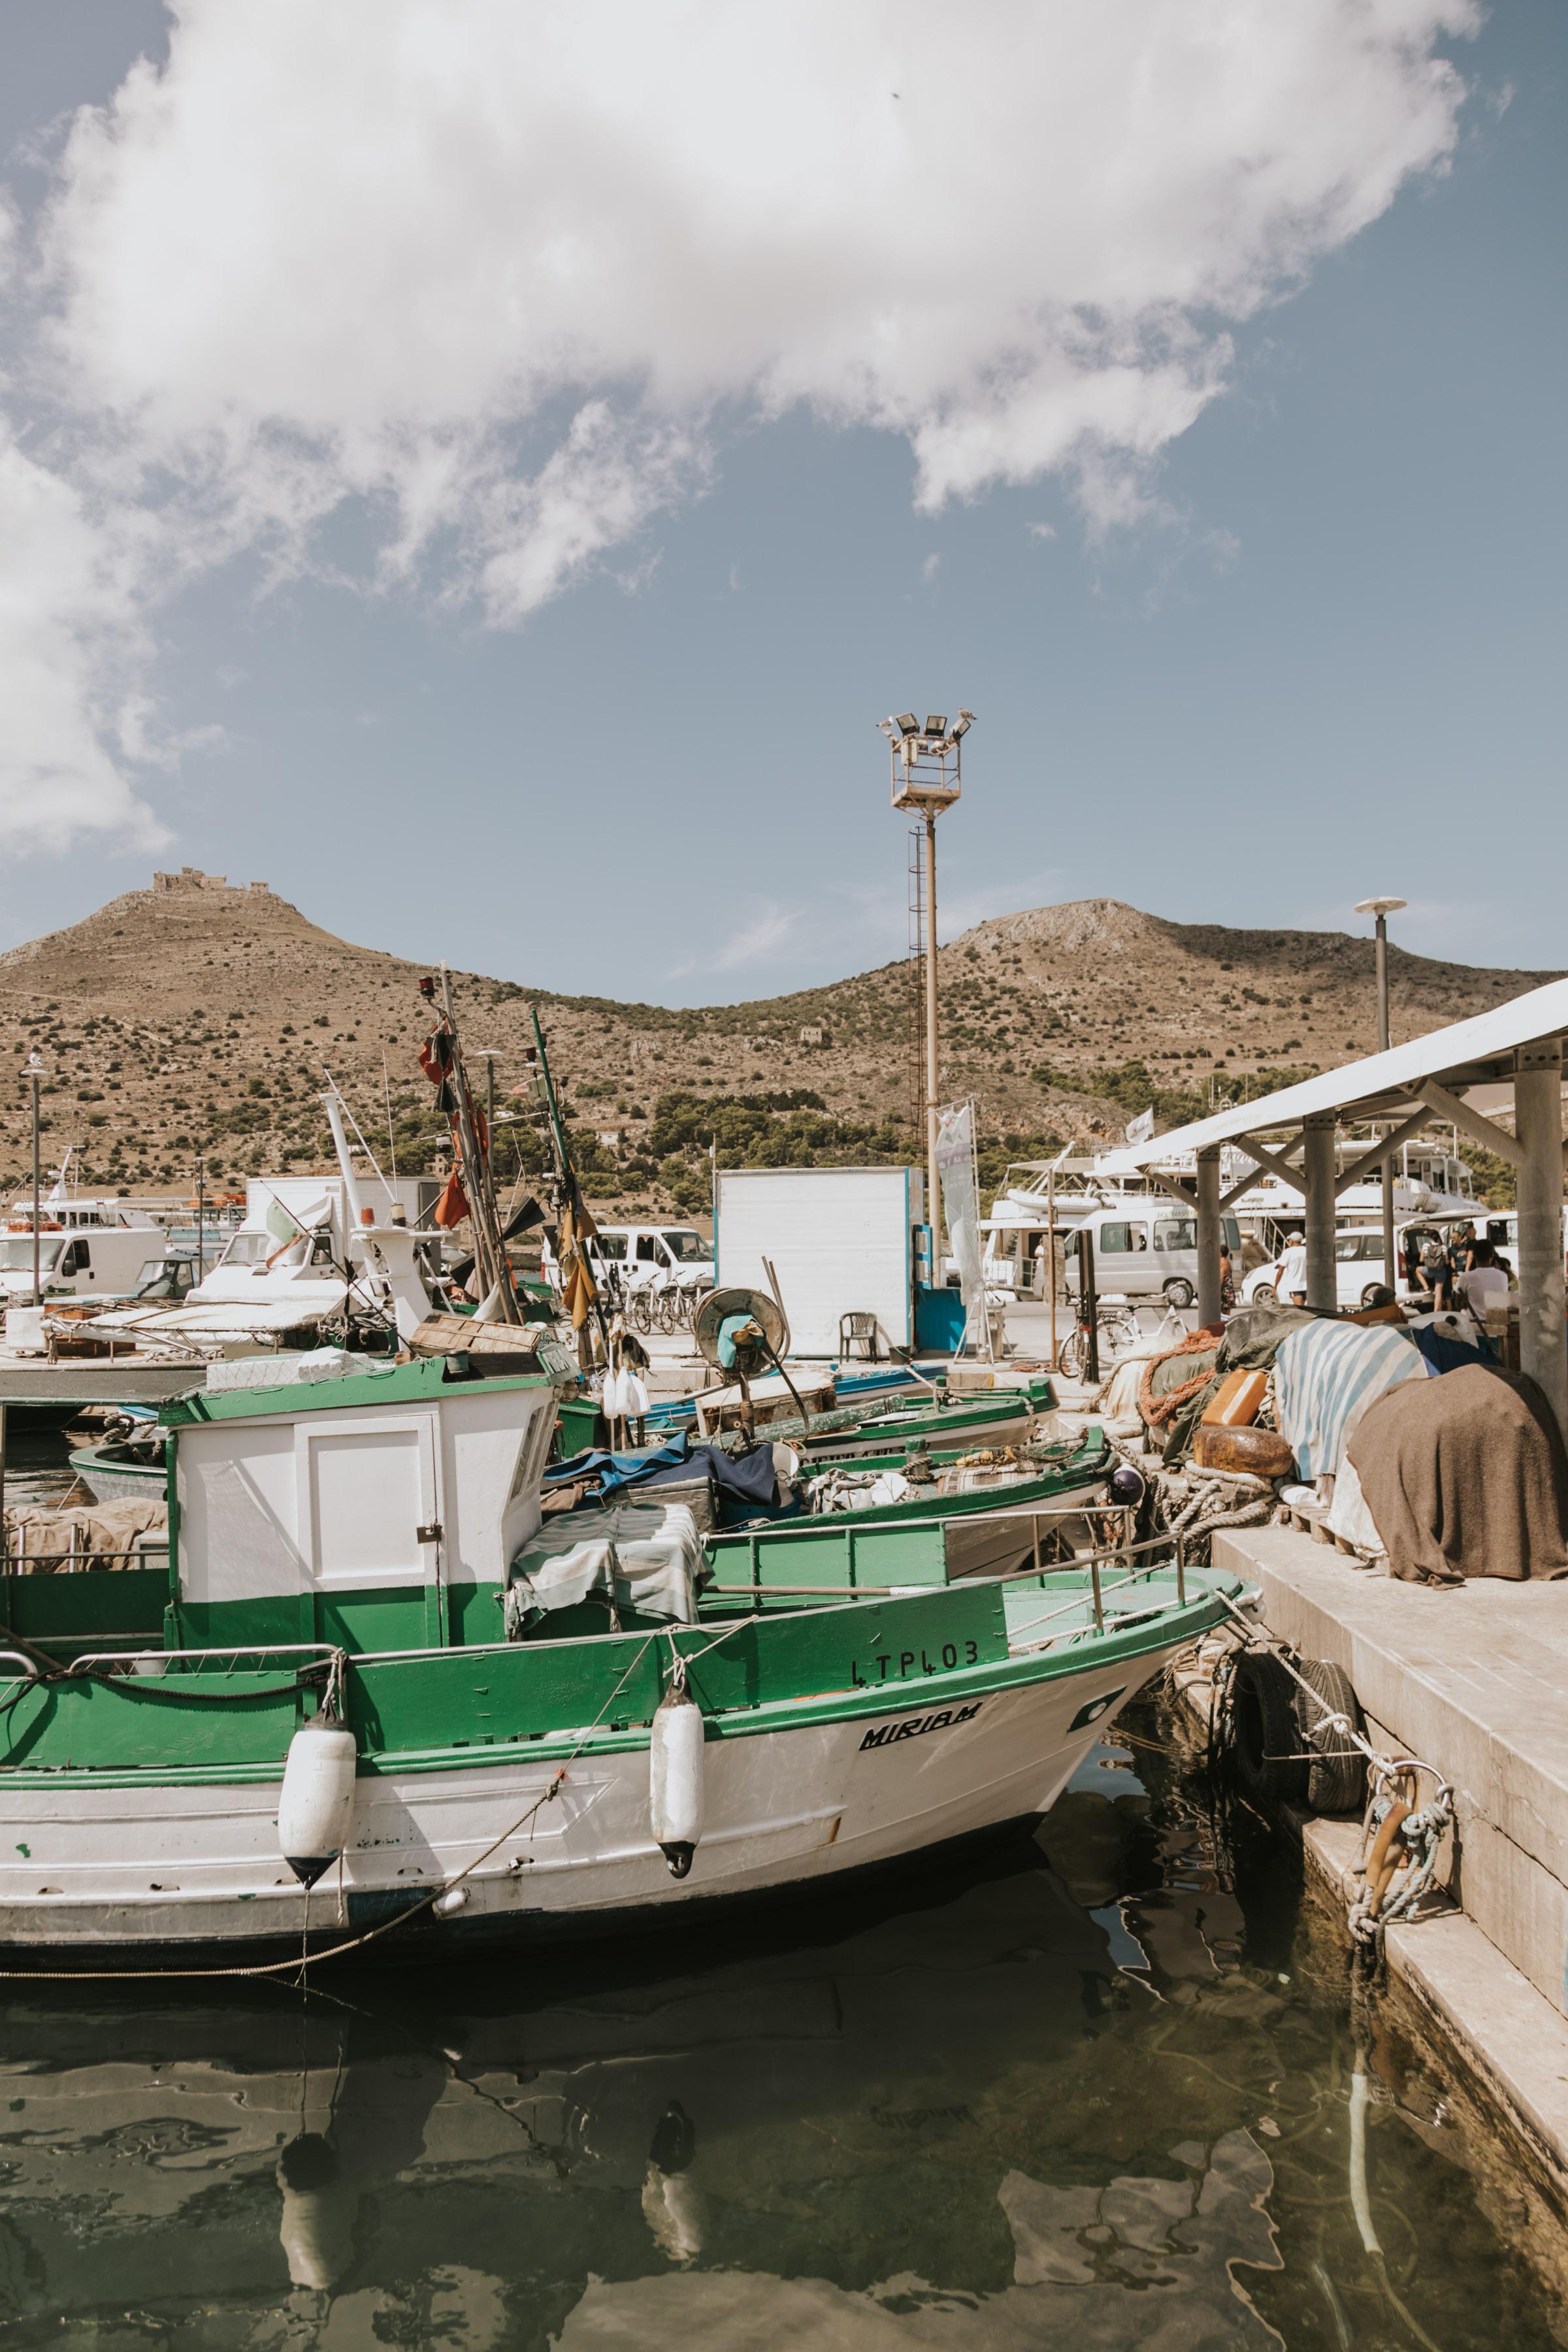 Sicily-AUG2018-CreditAllisonKuhlPhotos-5432.jpg